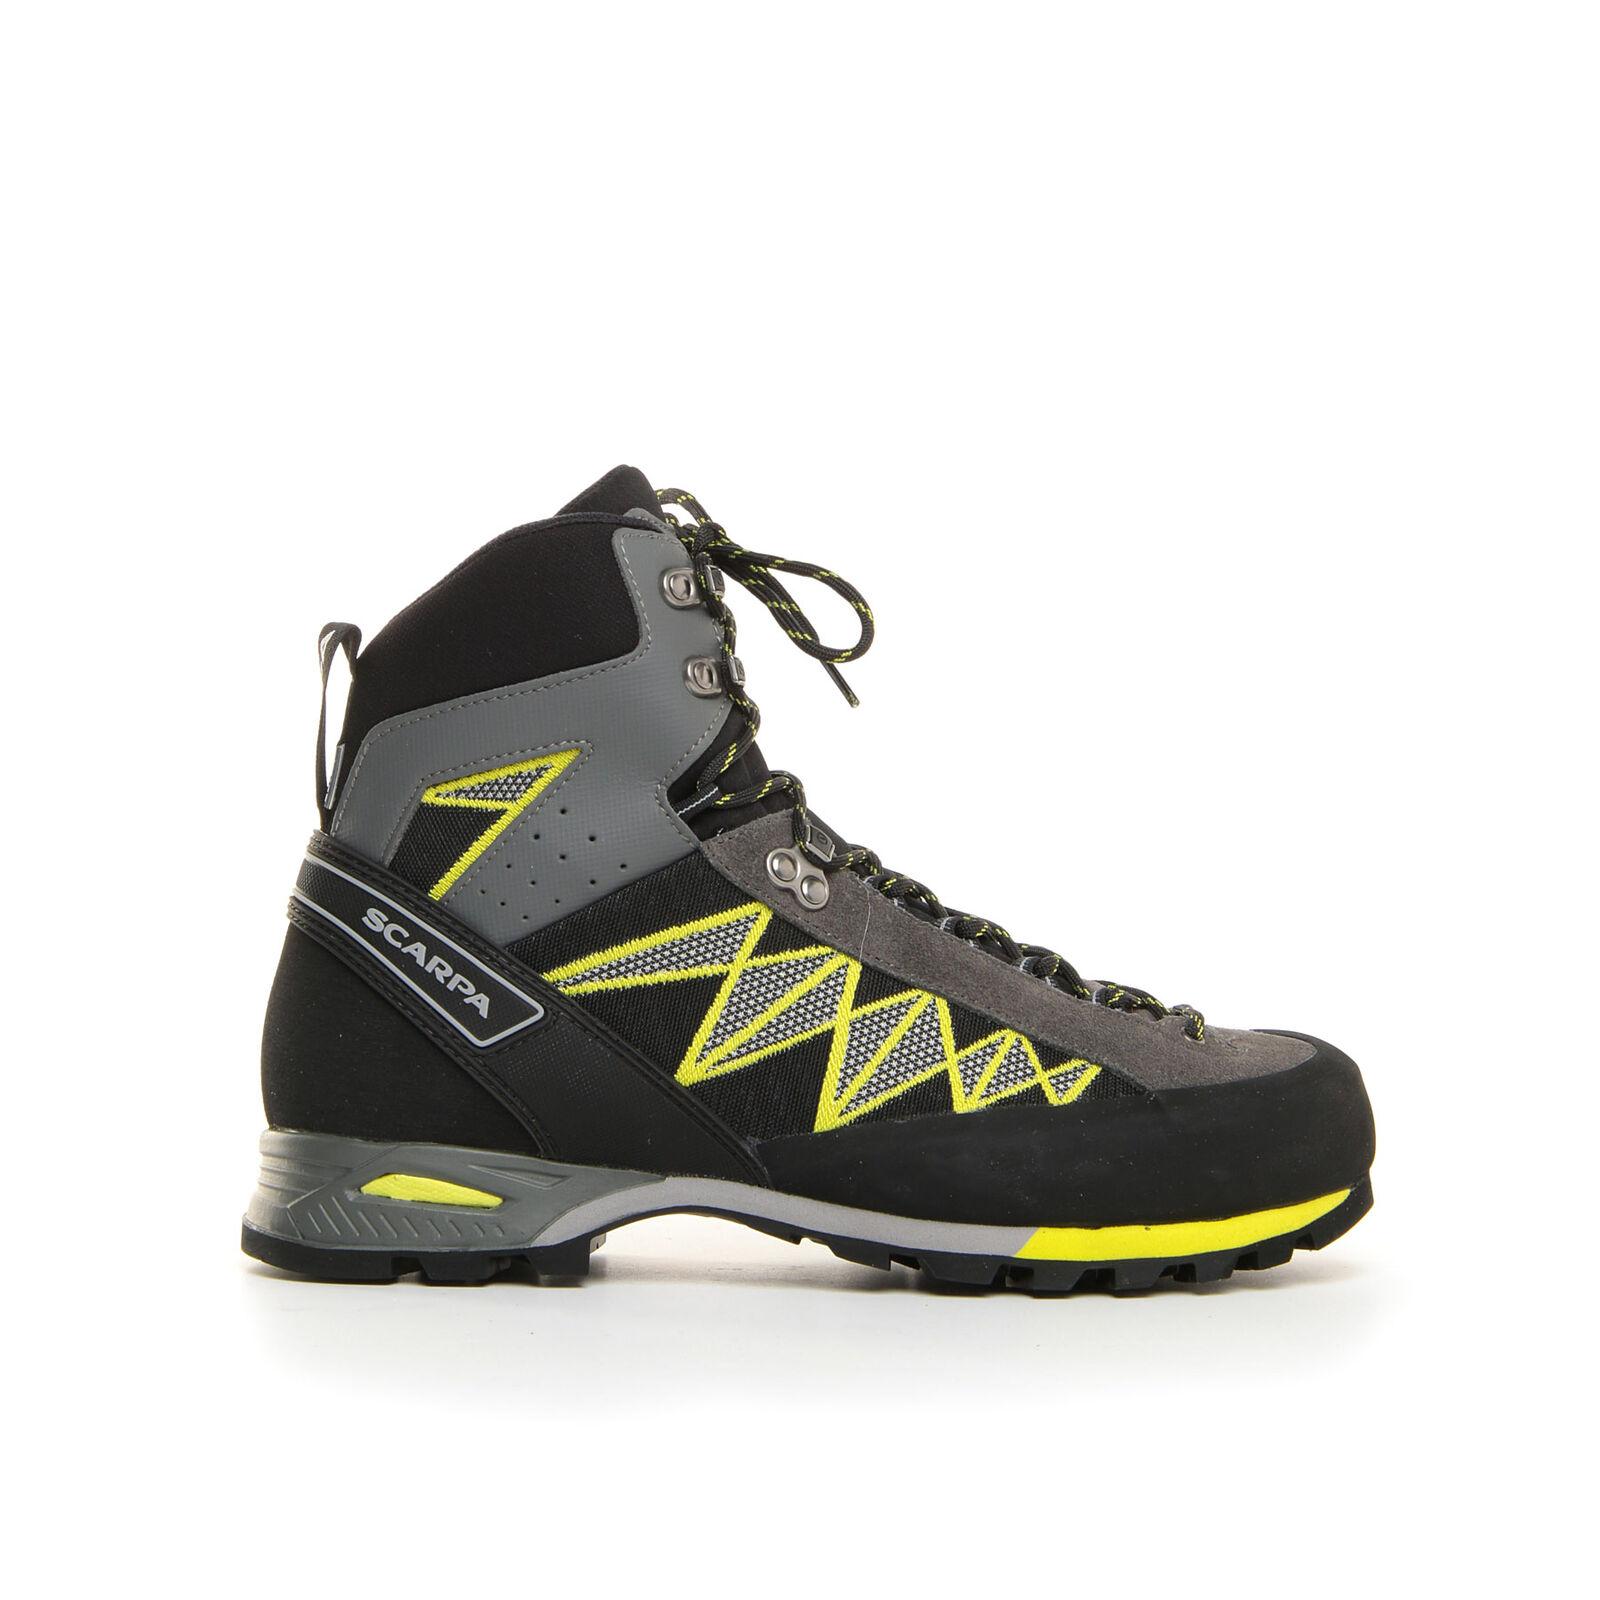 shoes marmolada trek shoes  mens hiking od 60024 250  official quality